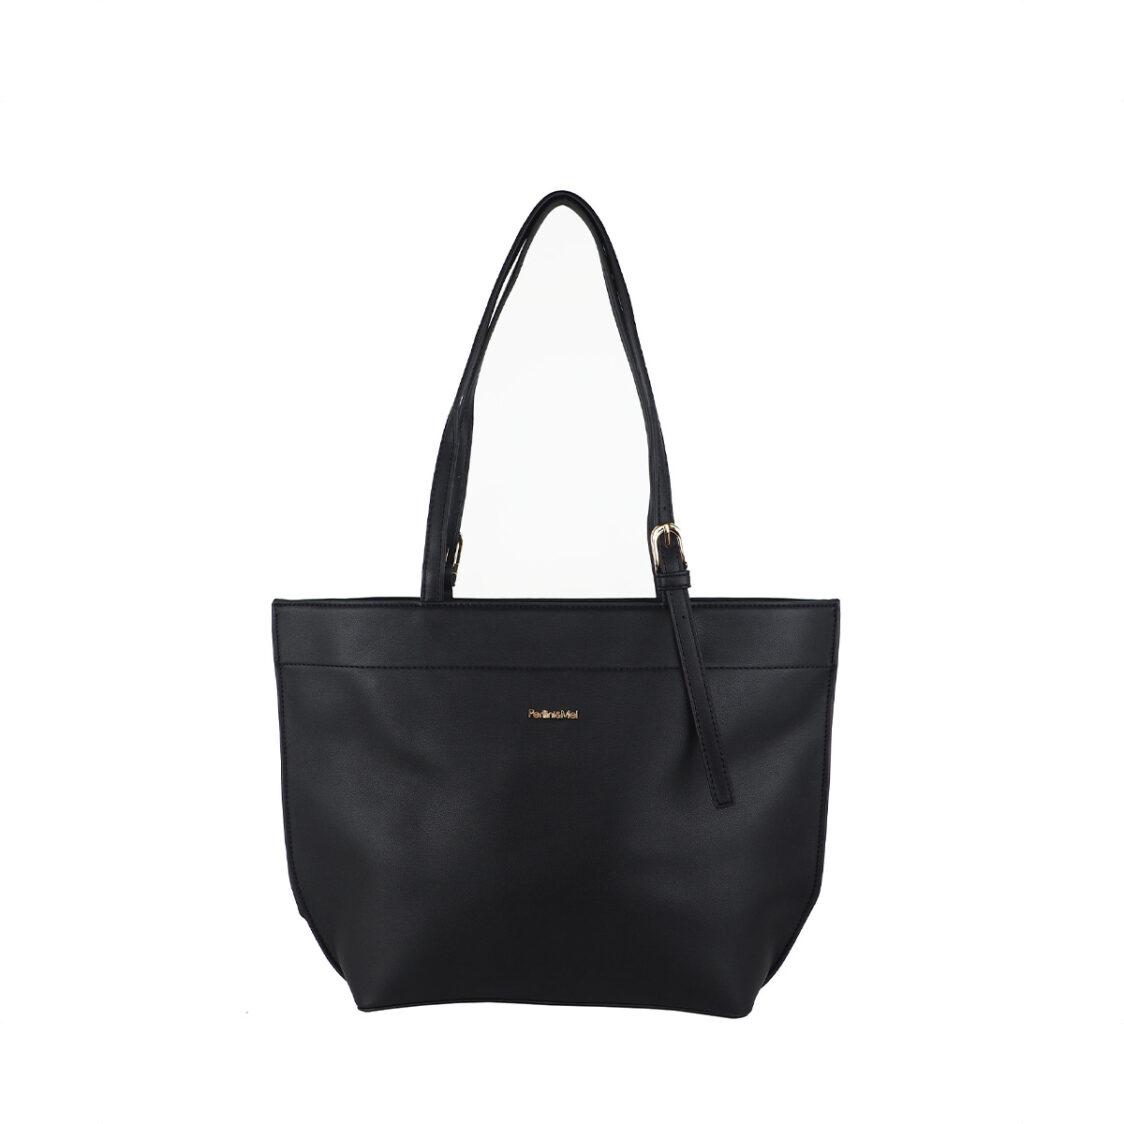 Perllini  Mel Double Handle Tote Bag Black PF7470-Blk